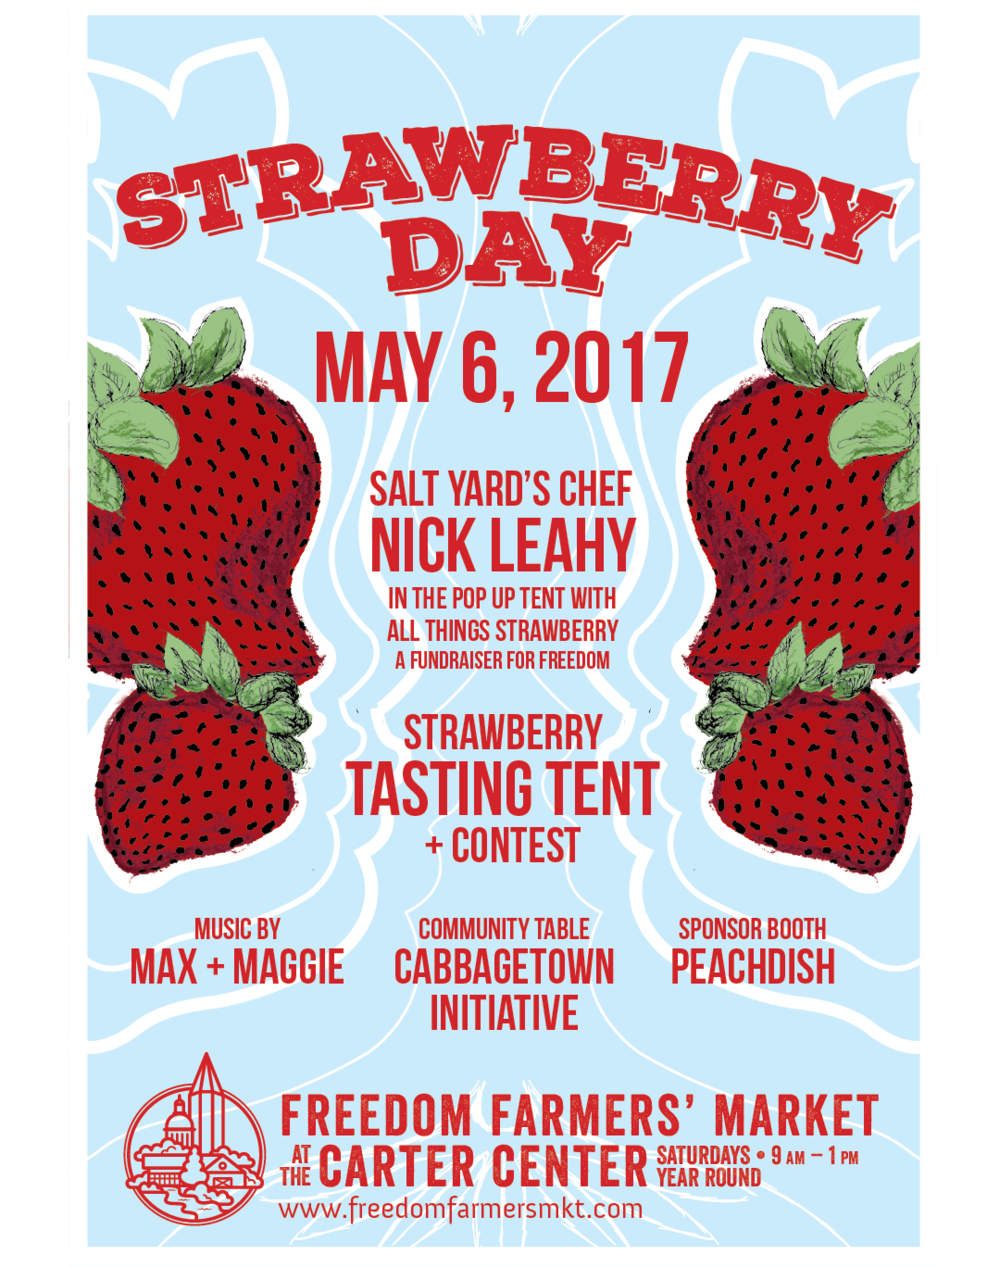 ffm-strawberry-2017-01.png